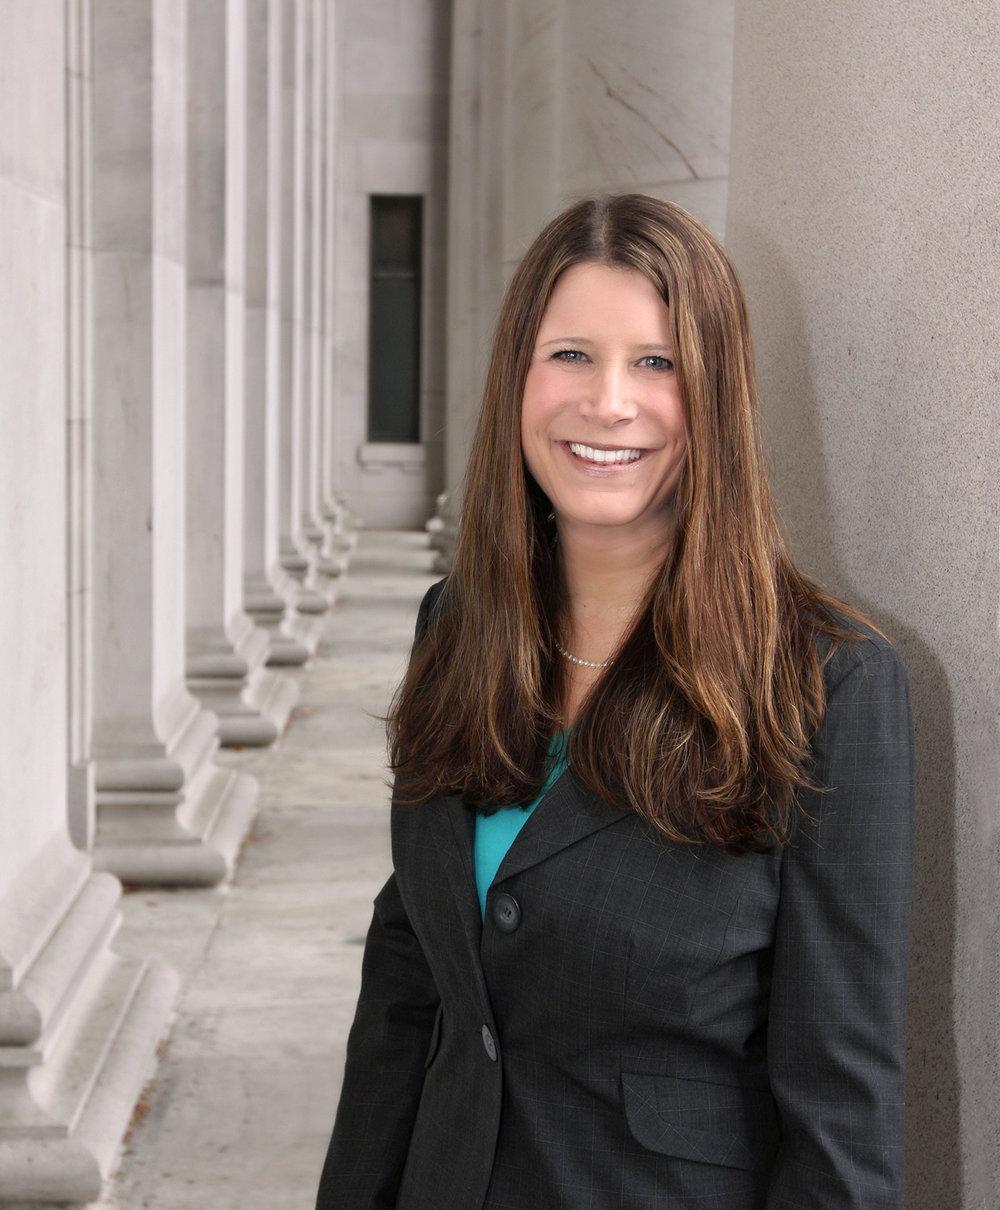 Lori Augino  Director of Elections  (360) 725-5771   lori.augino@sos.wa.gov    Website